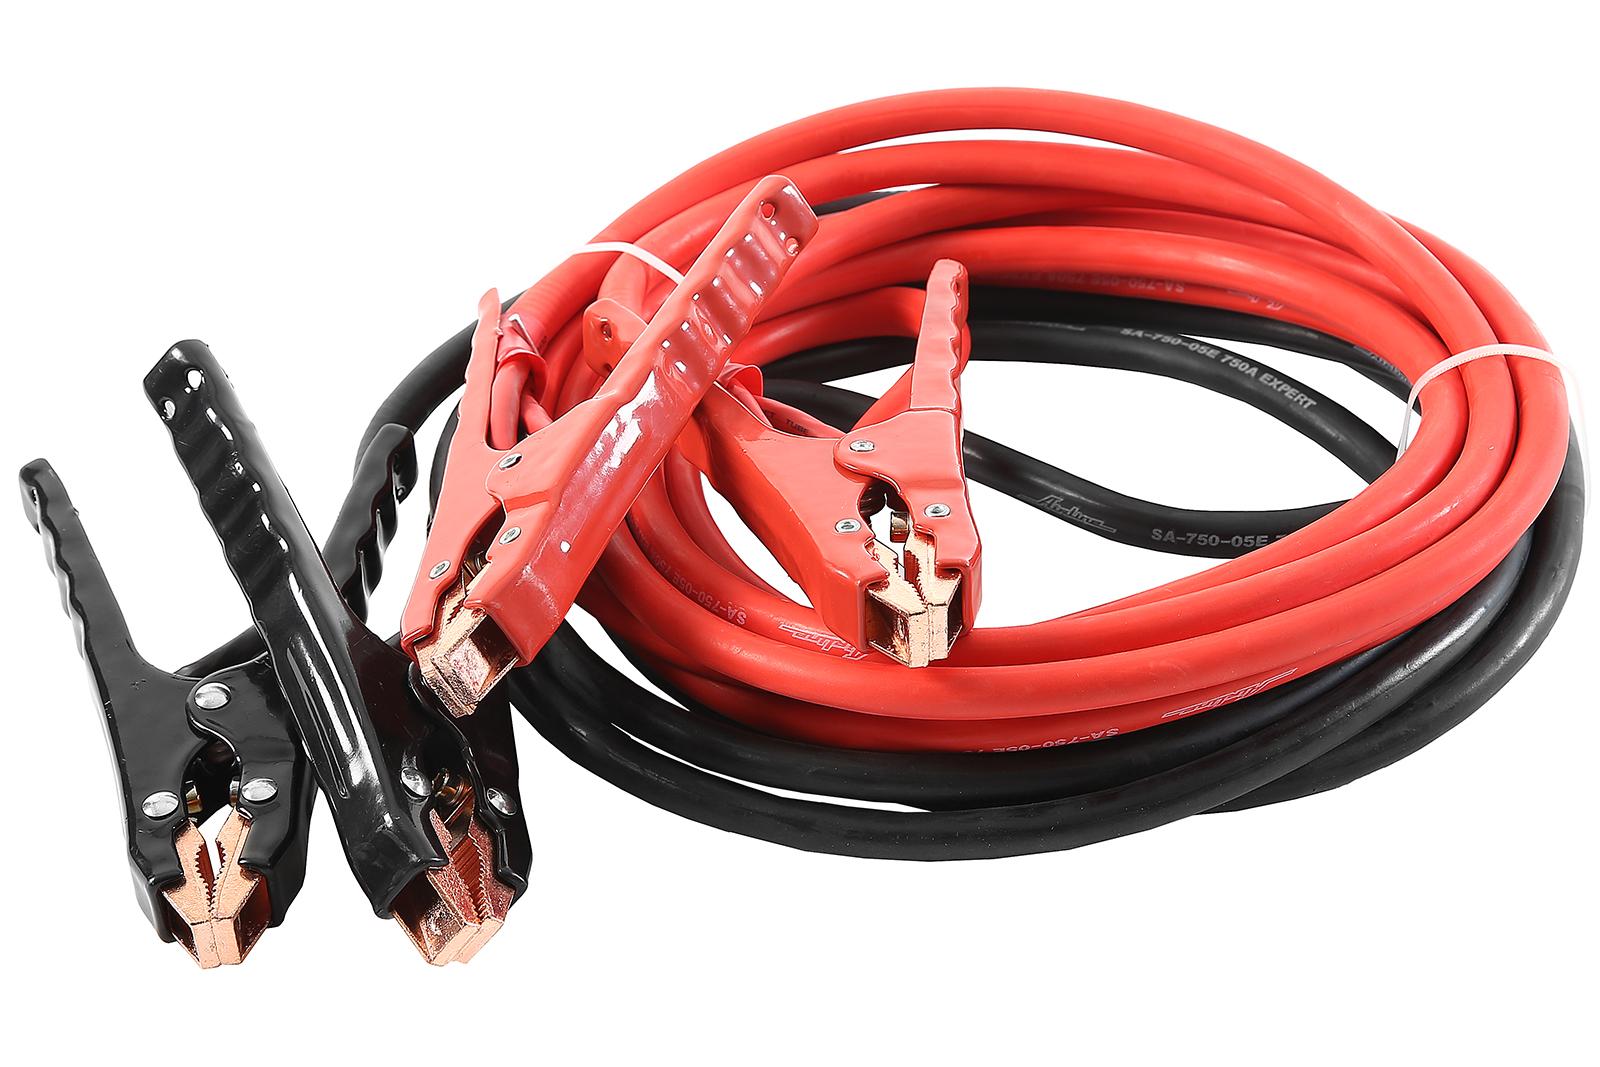 Провода для прикуривания Airline Expert sa-750-05e